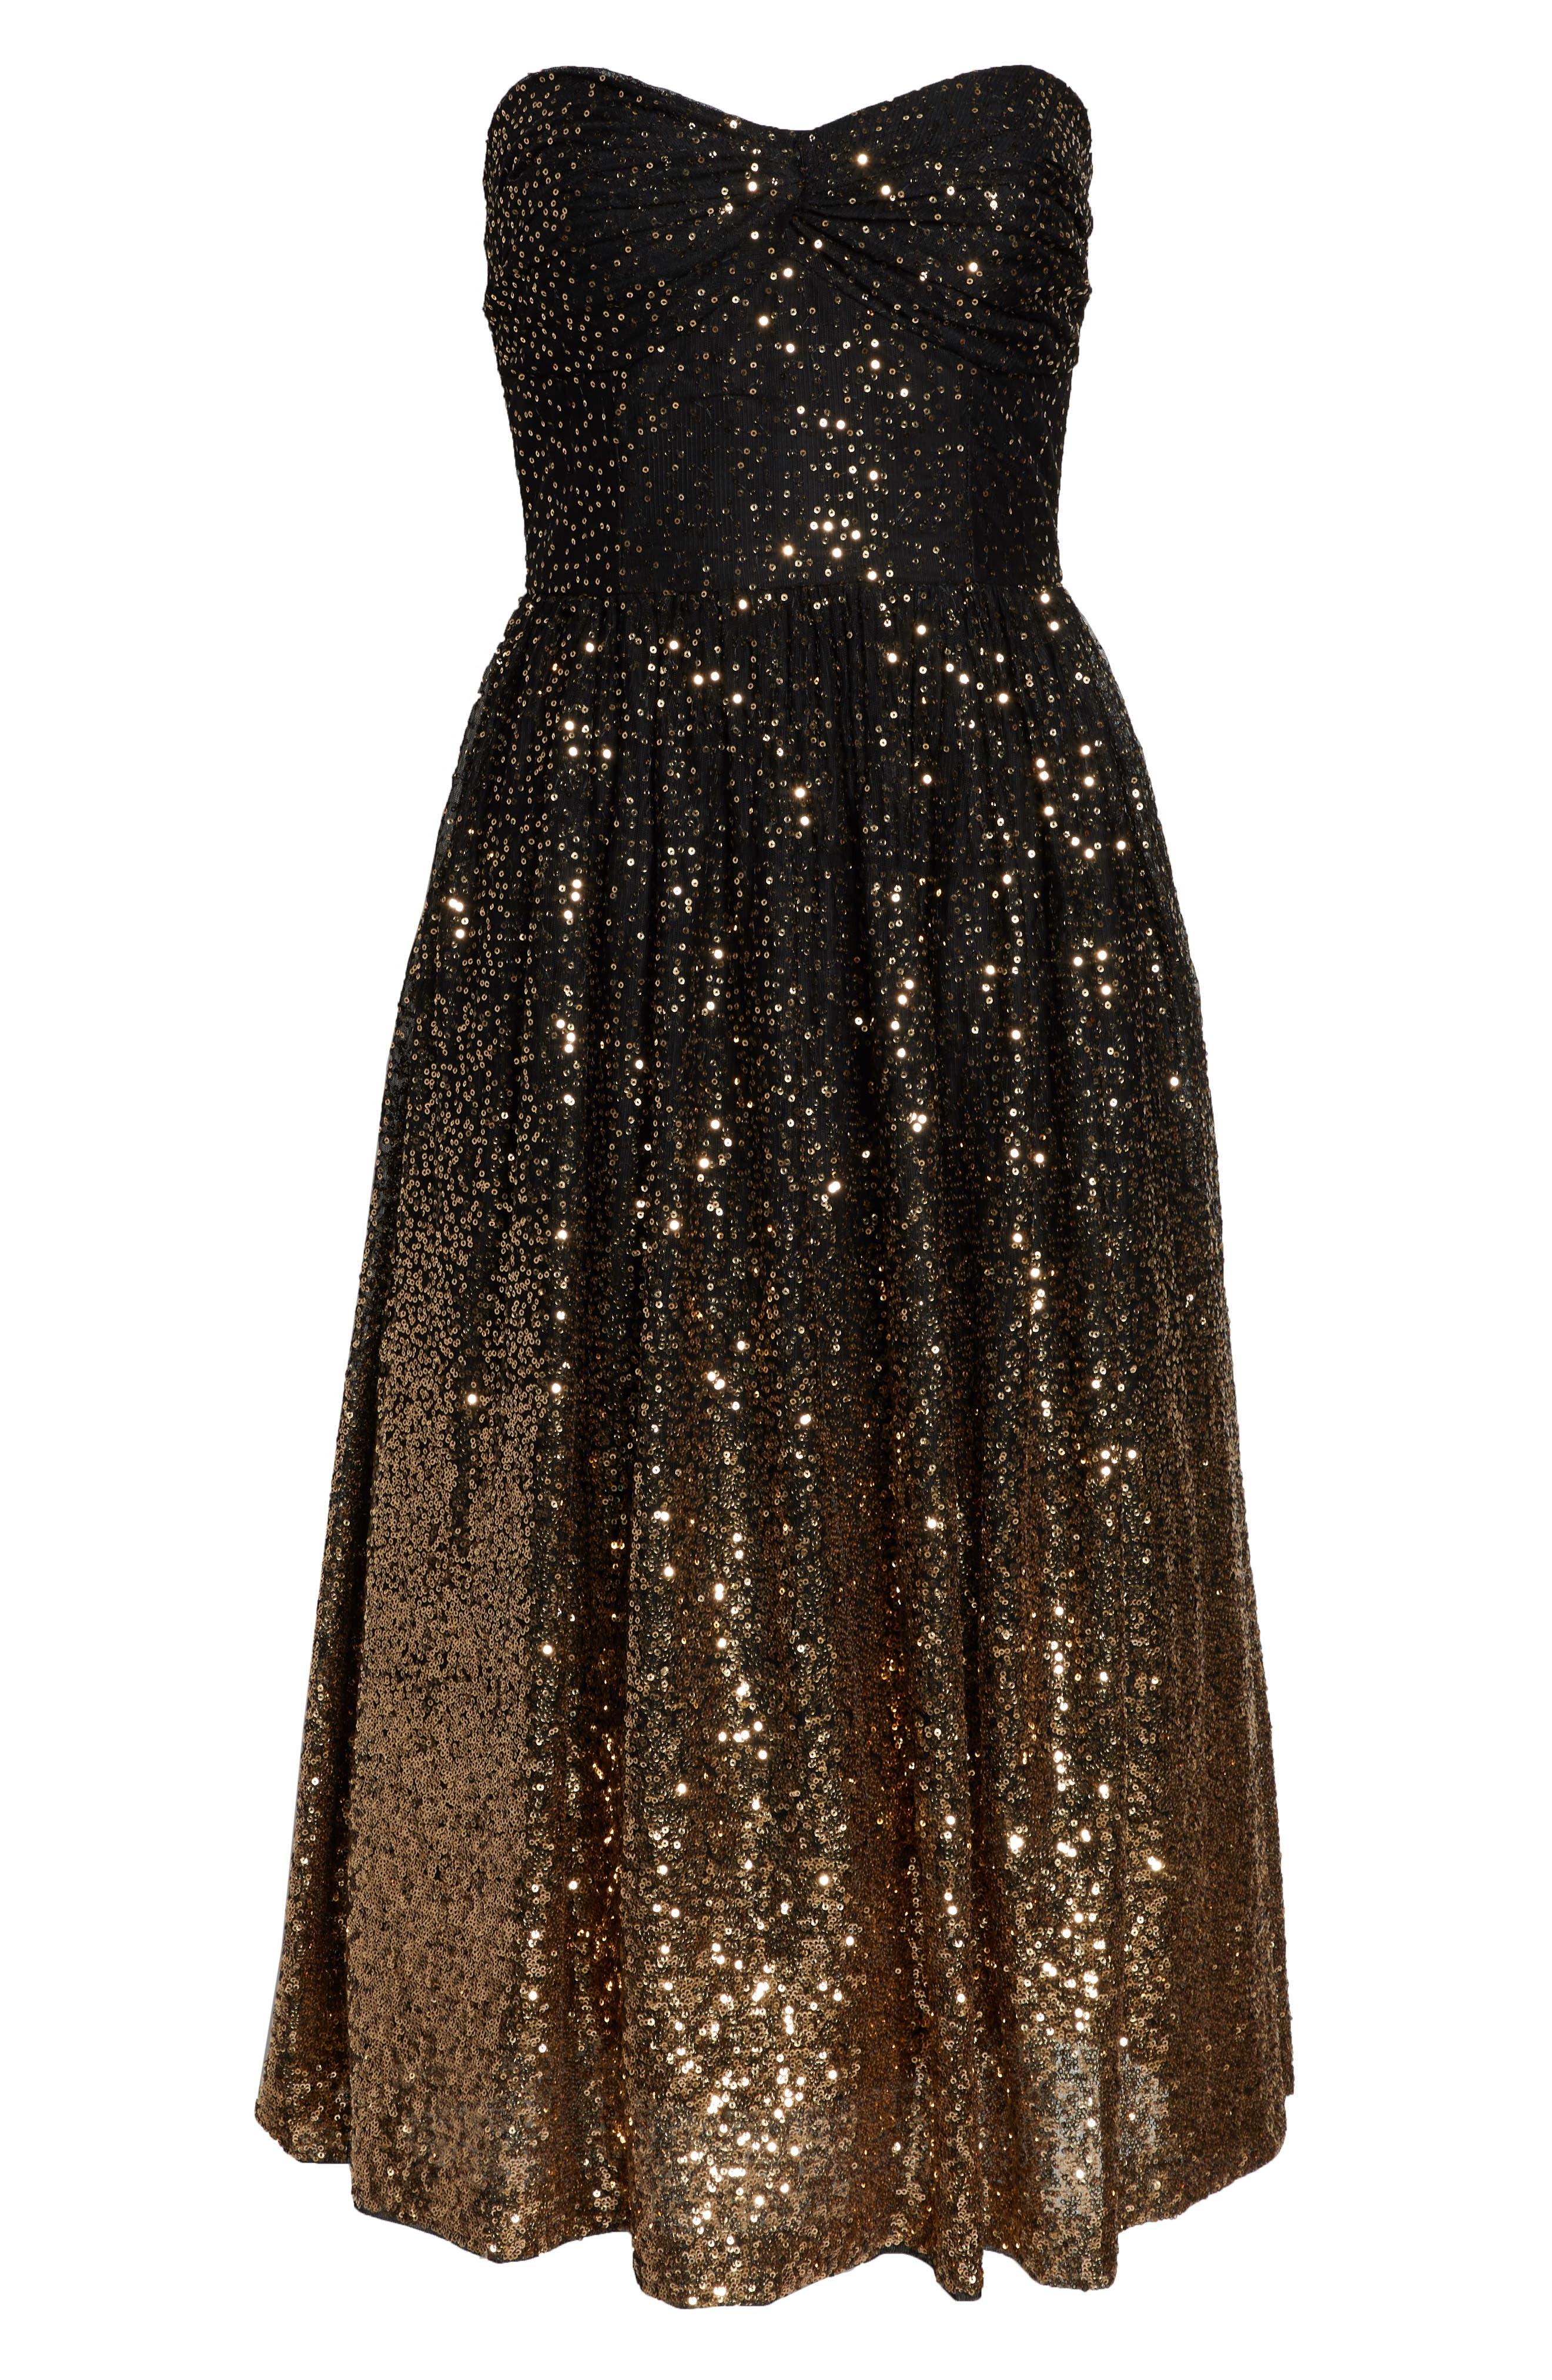 Strapless Midi Dress,                             Alternate thumbnail 7, color,                             BLACK GOLD